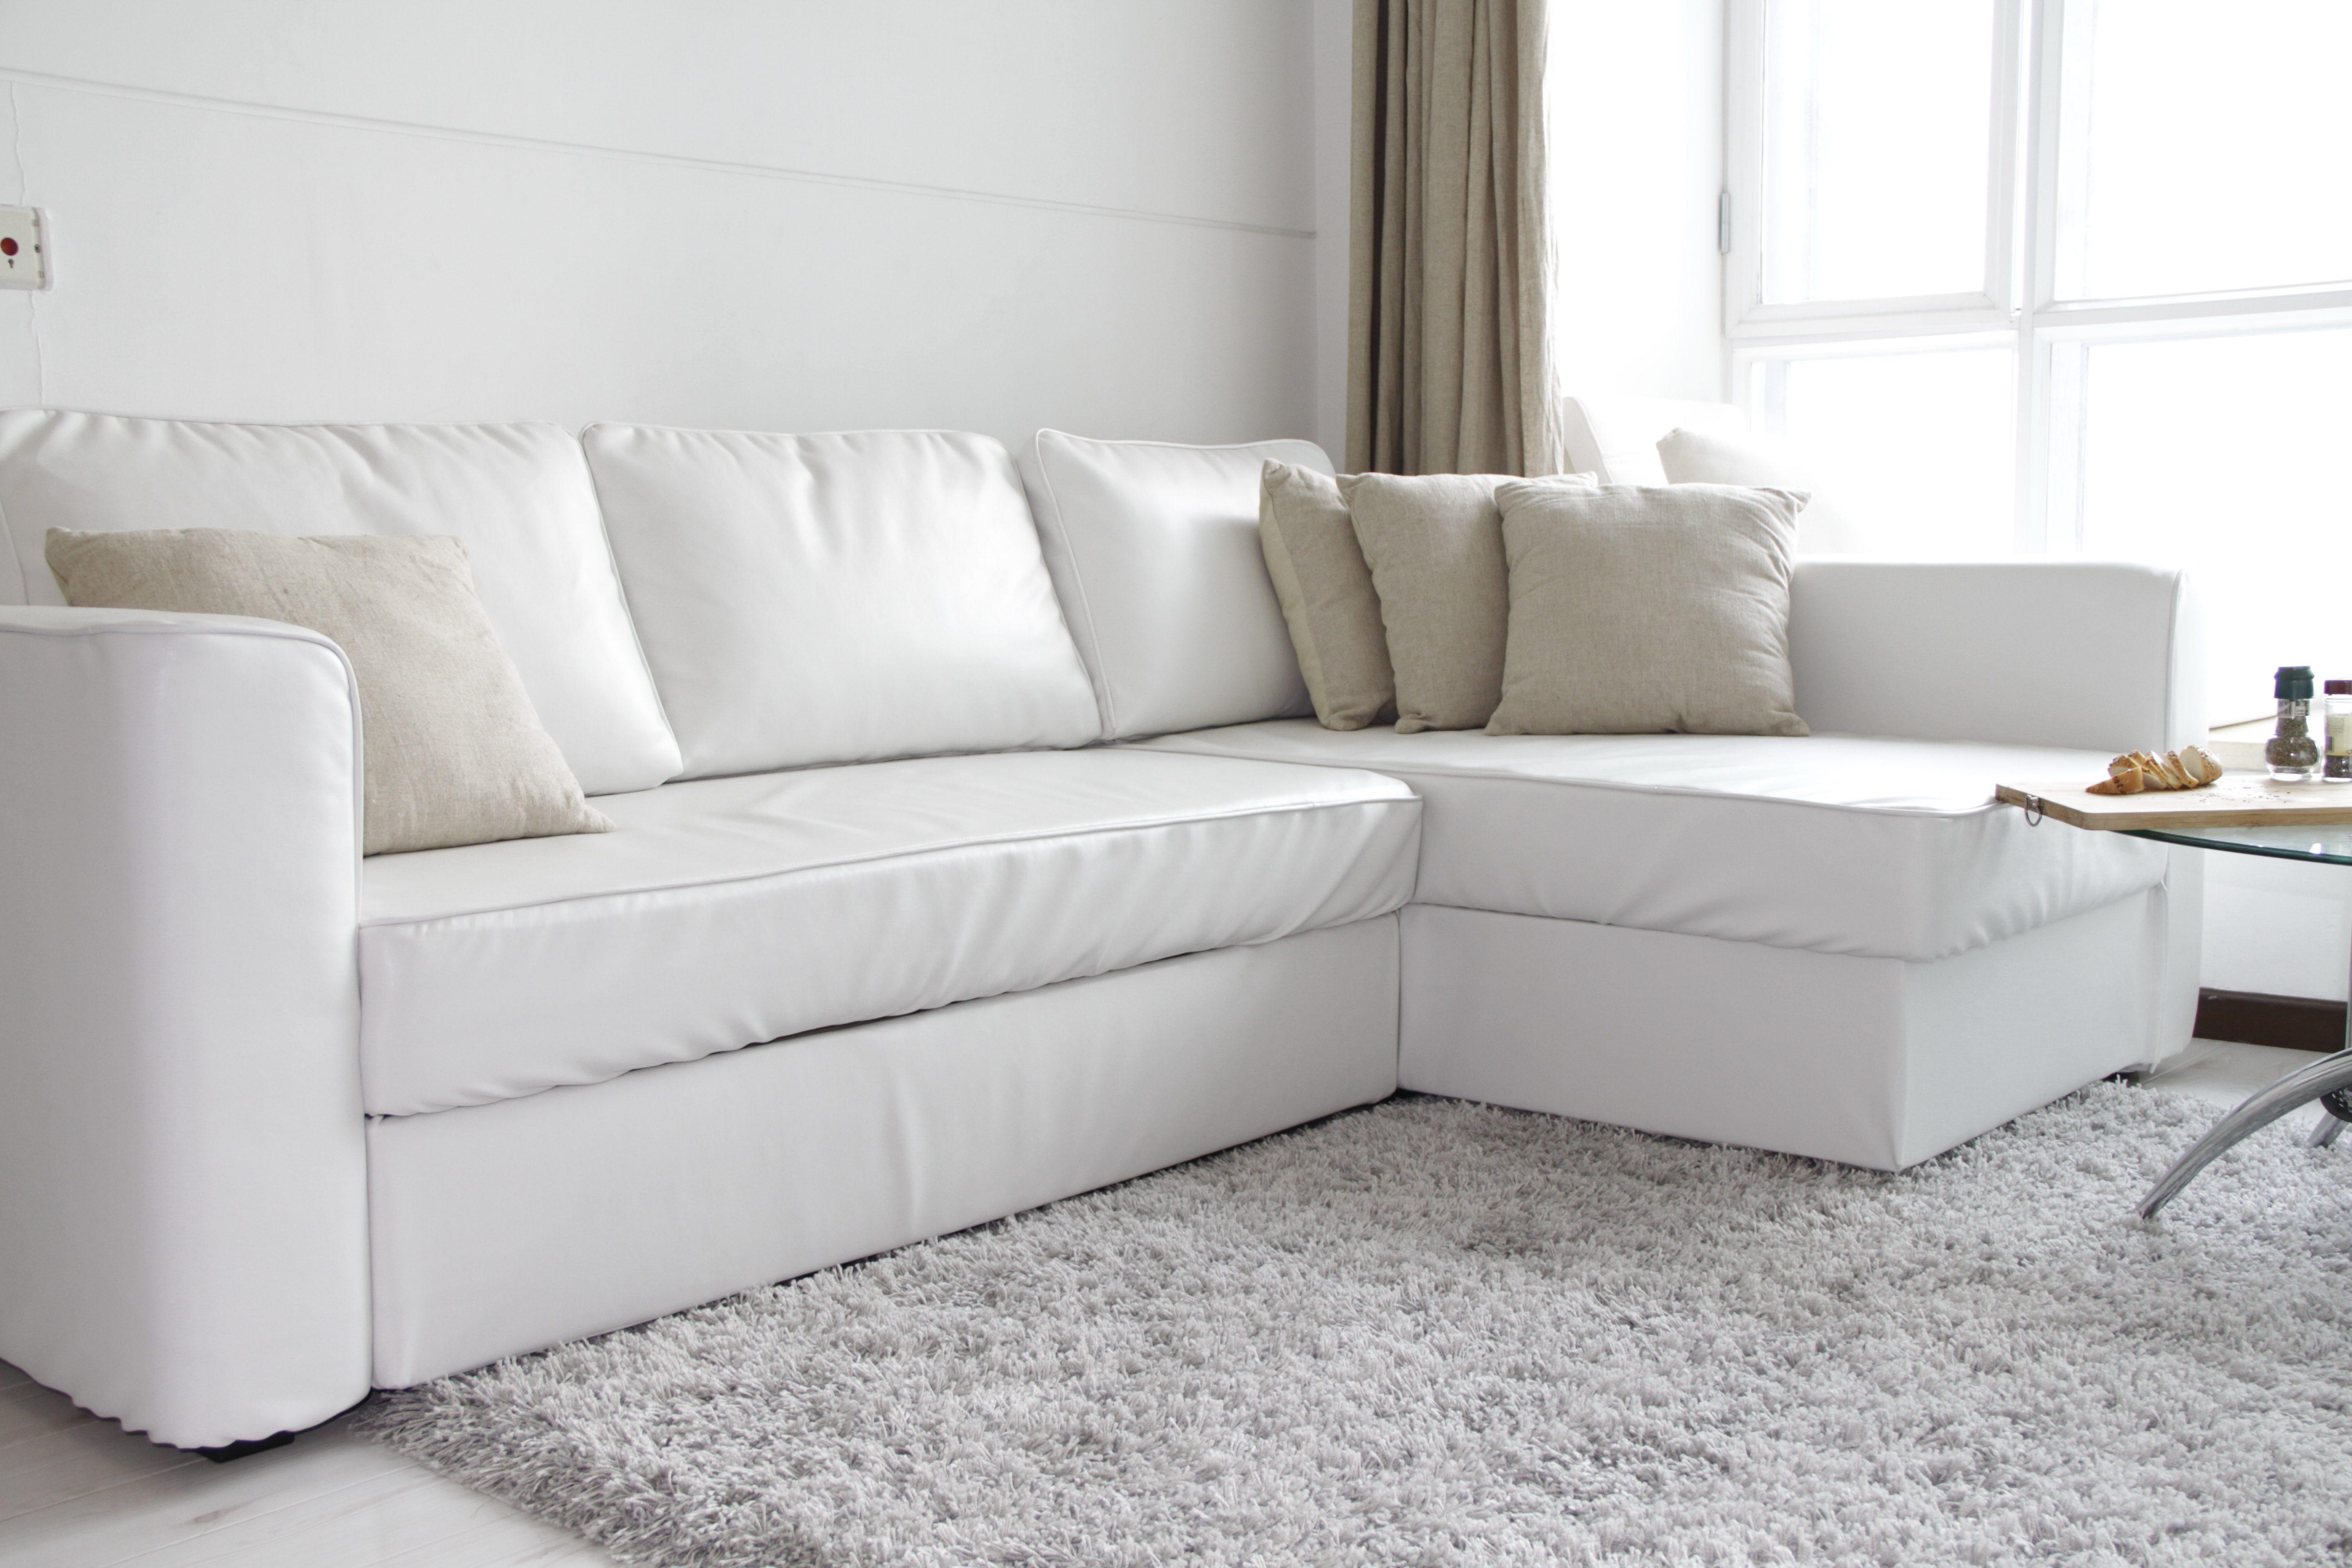 Terrific Guide To Buying Manstad Or Fagelbo Comfort Works Slipcover Evergreenethics Interior Chair Design Evergreenethicsorg